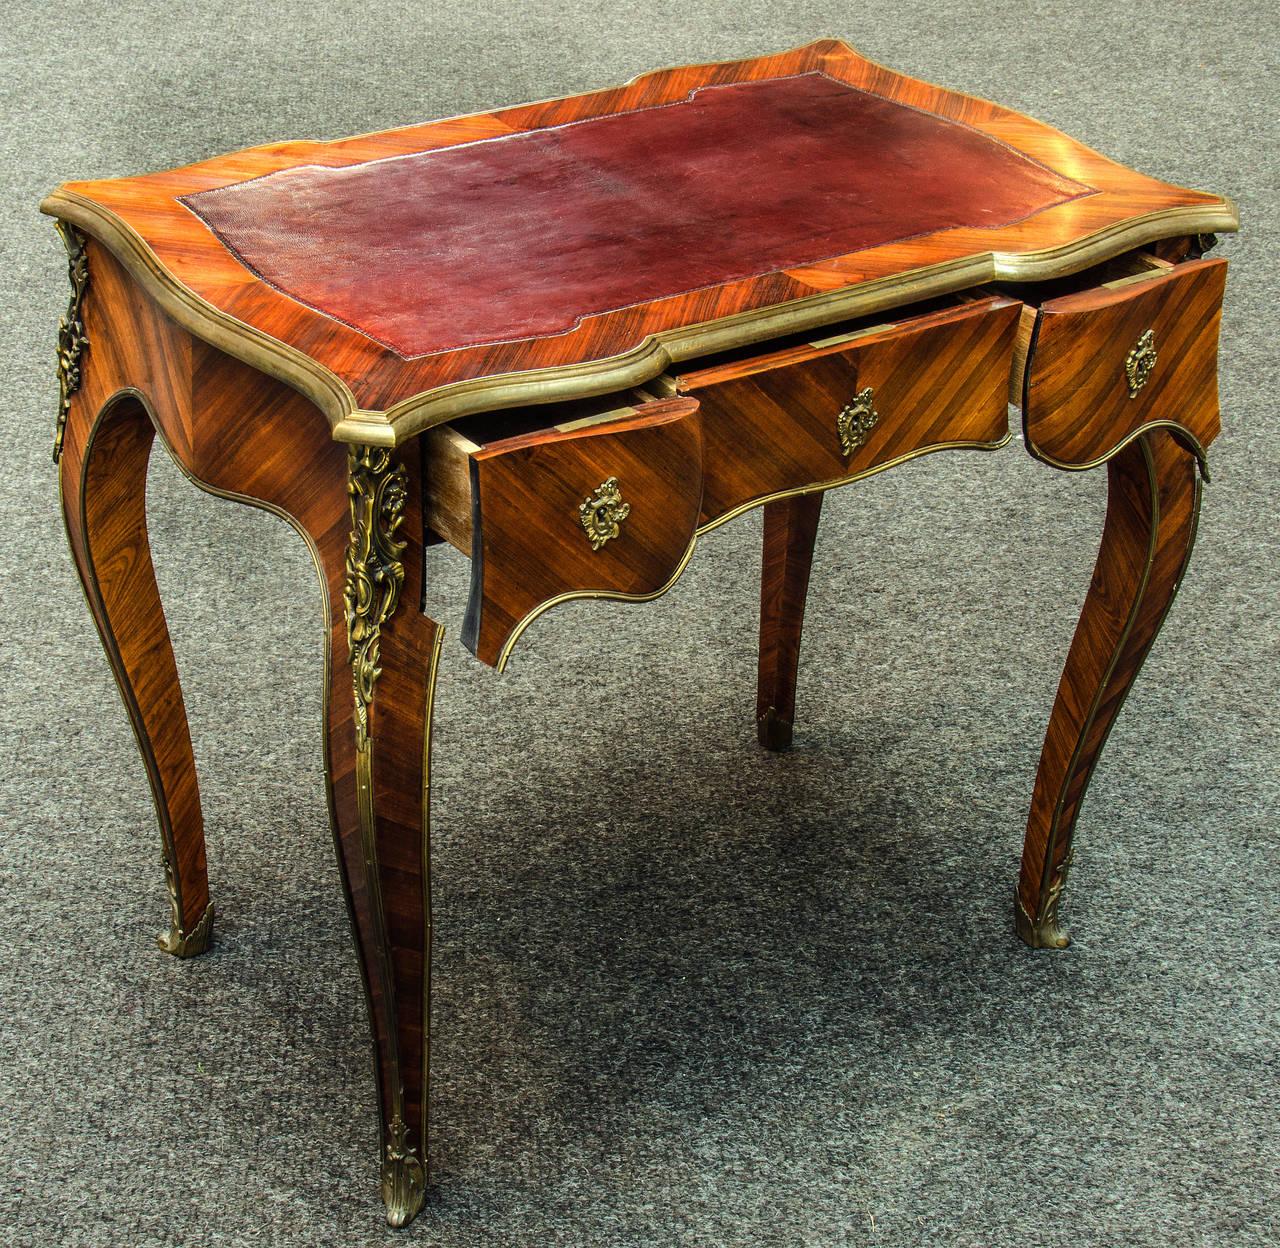 antique louis xv rosewood bureau plat for sale at 1stdibs. Black Bedroom Furniture Sets. Home Design Ideas